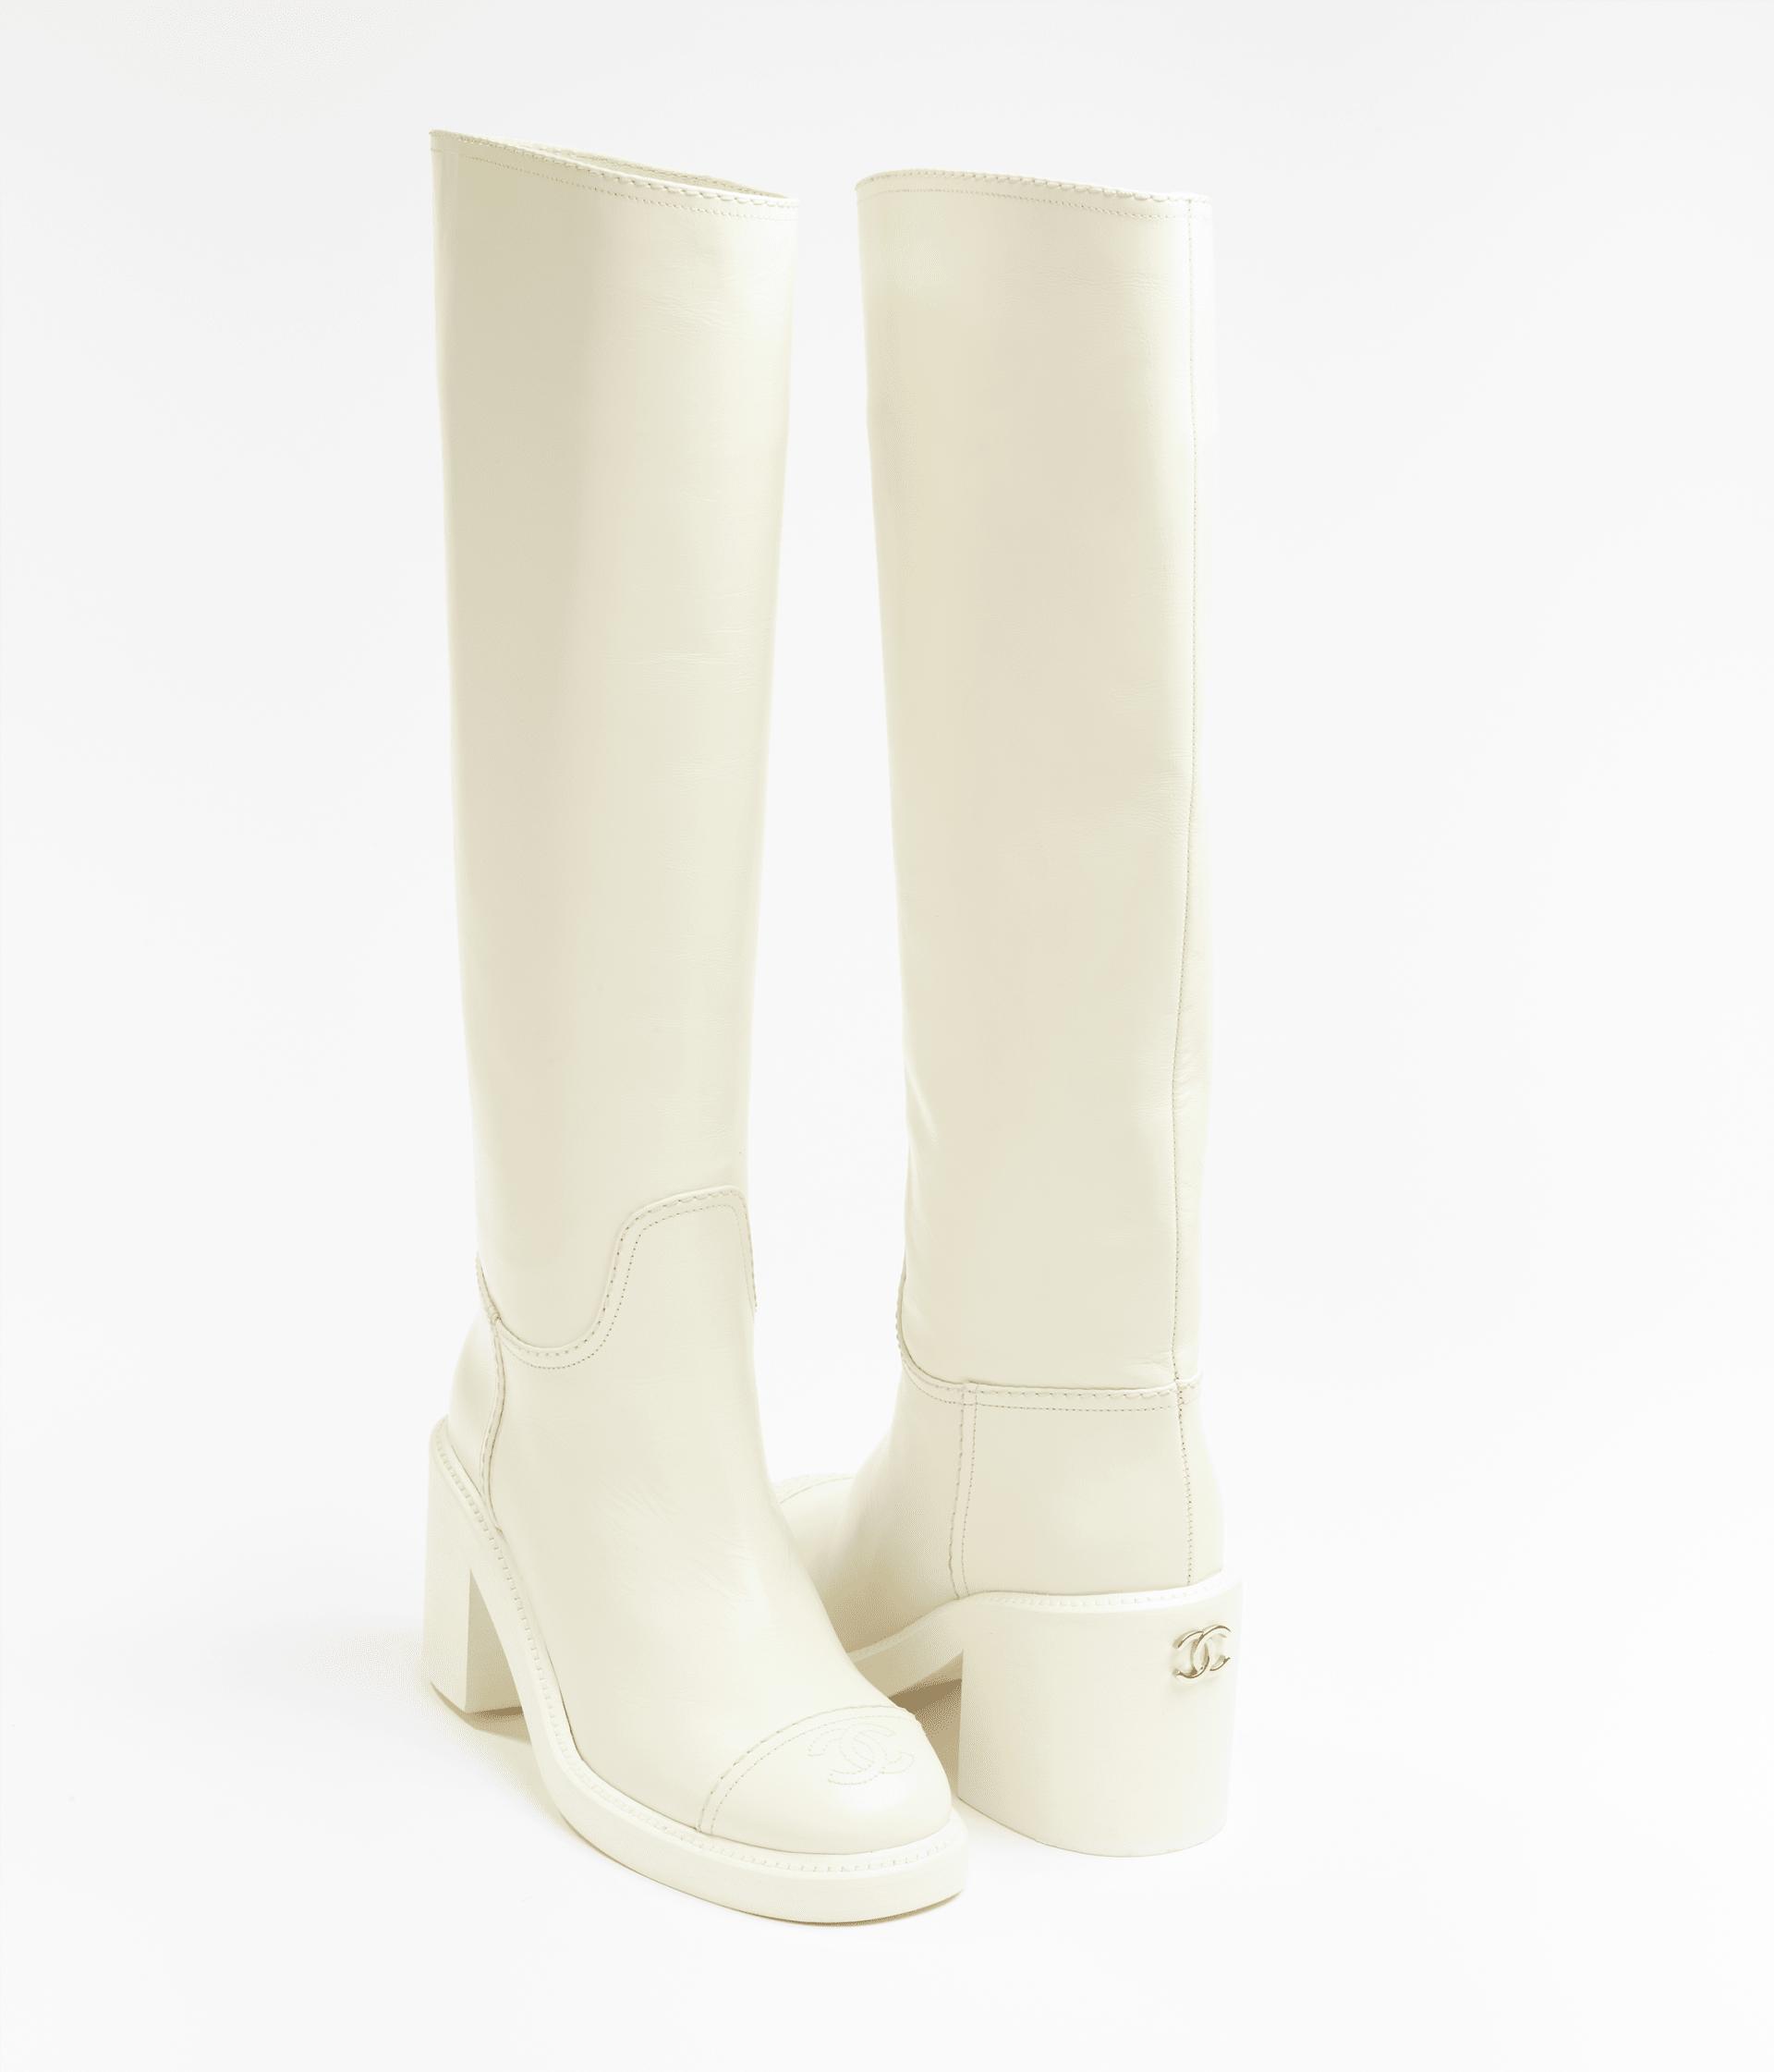 image 3 - High Boots - Calfskin - White